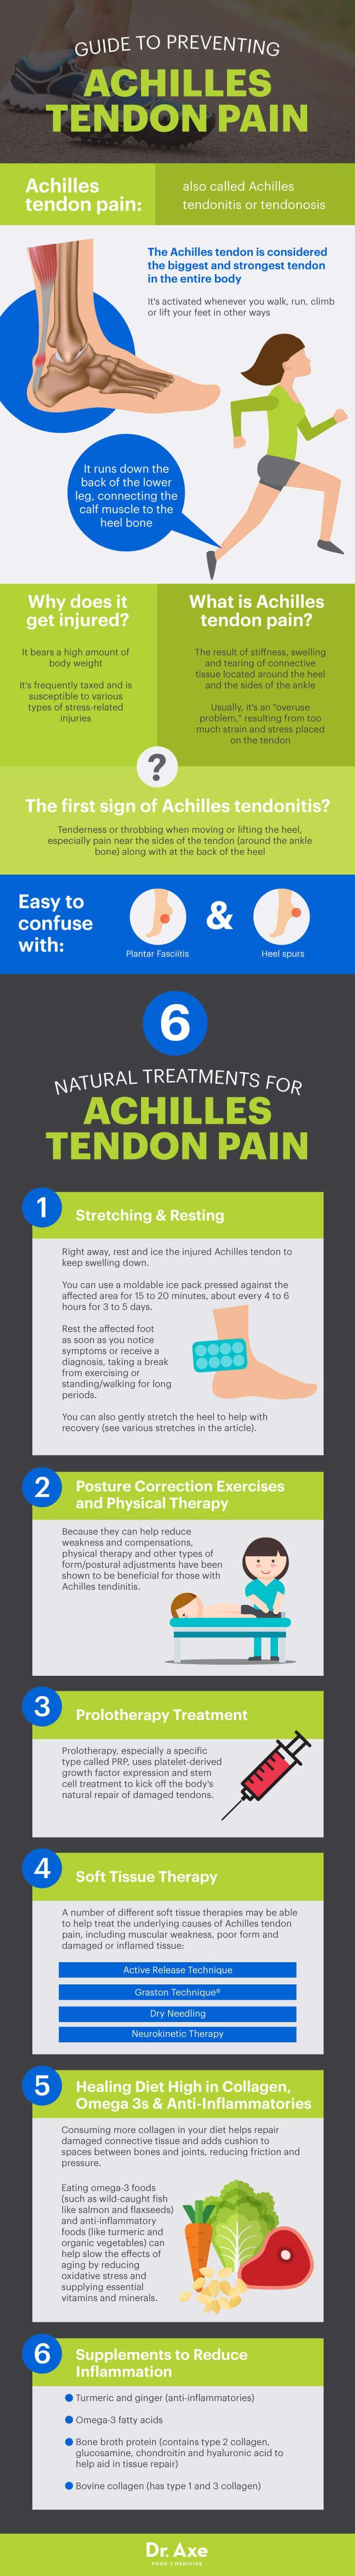 Achilles tendon pain  http://www.draxe.com #health #holistic #natural